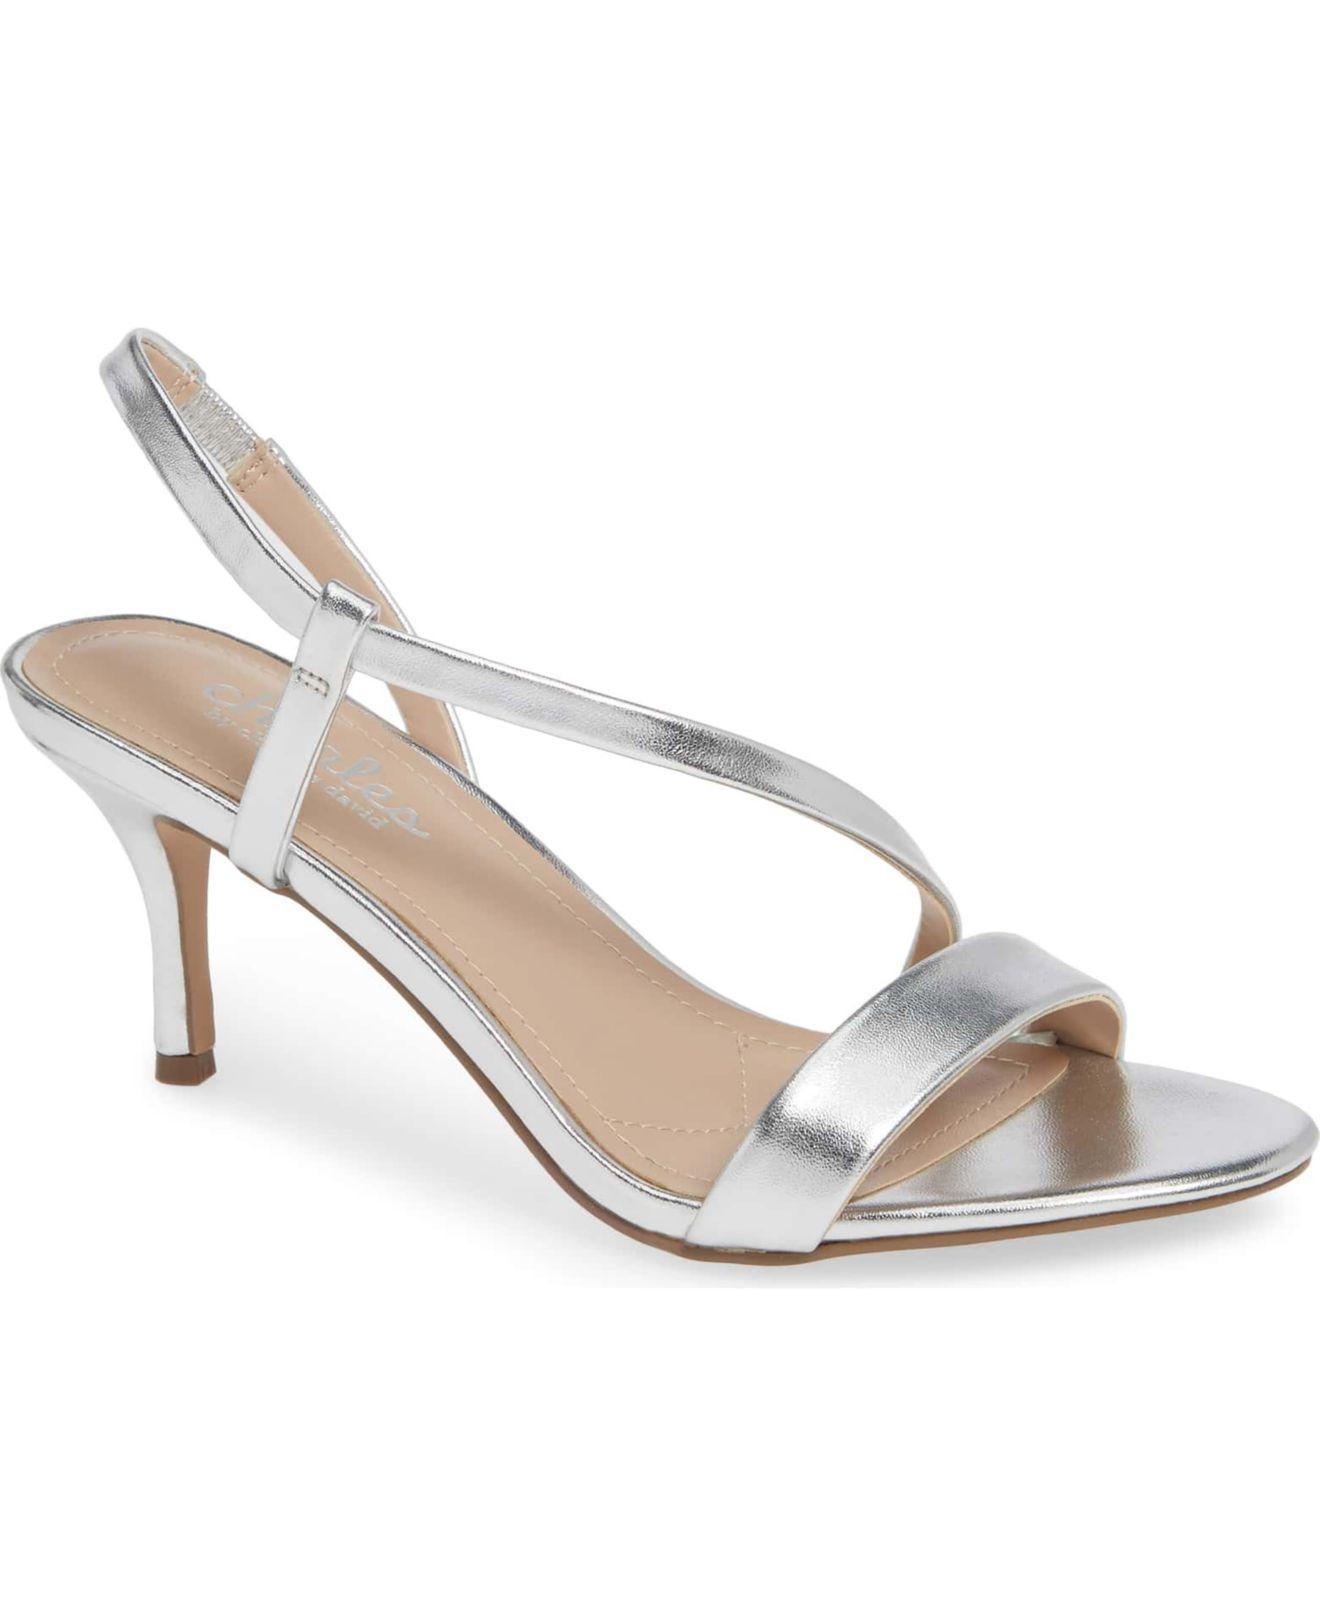 17fbd0444e3e Lyst - Charles David Bermuda Dress Sandals in Metallic